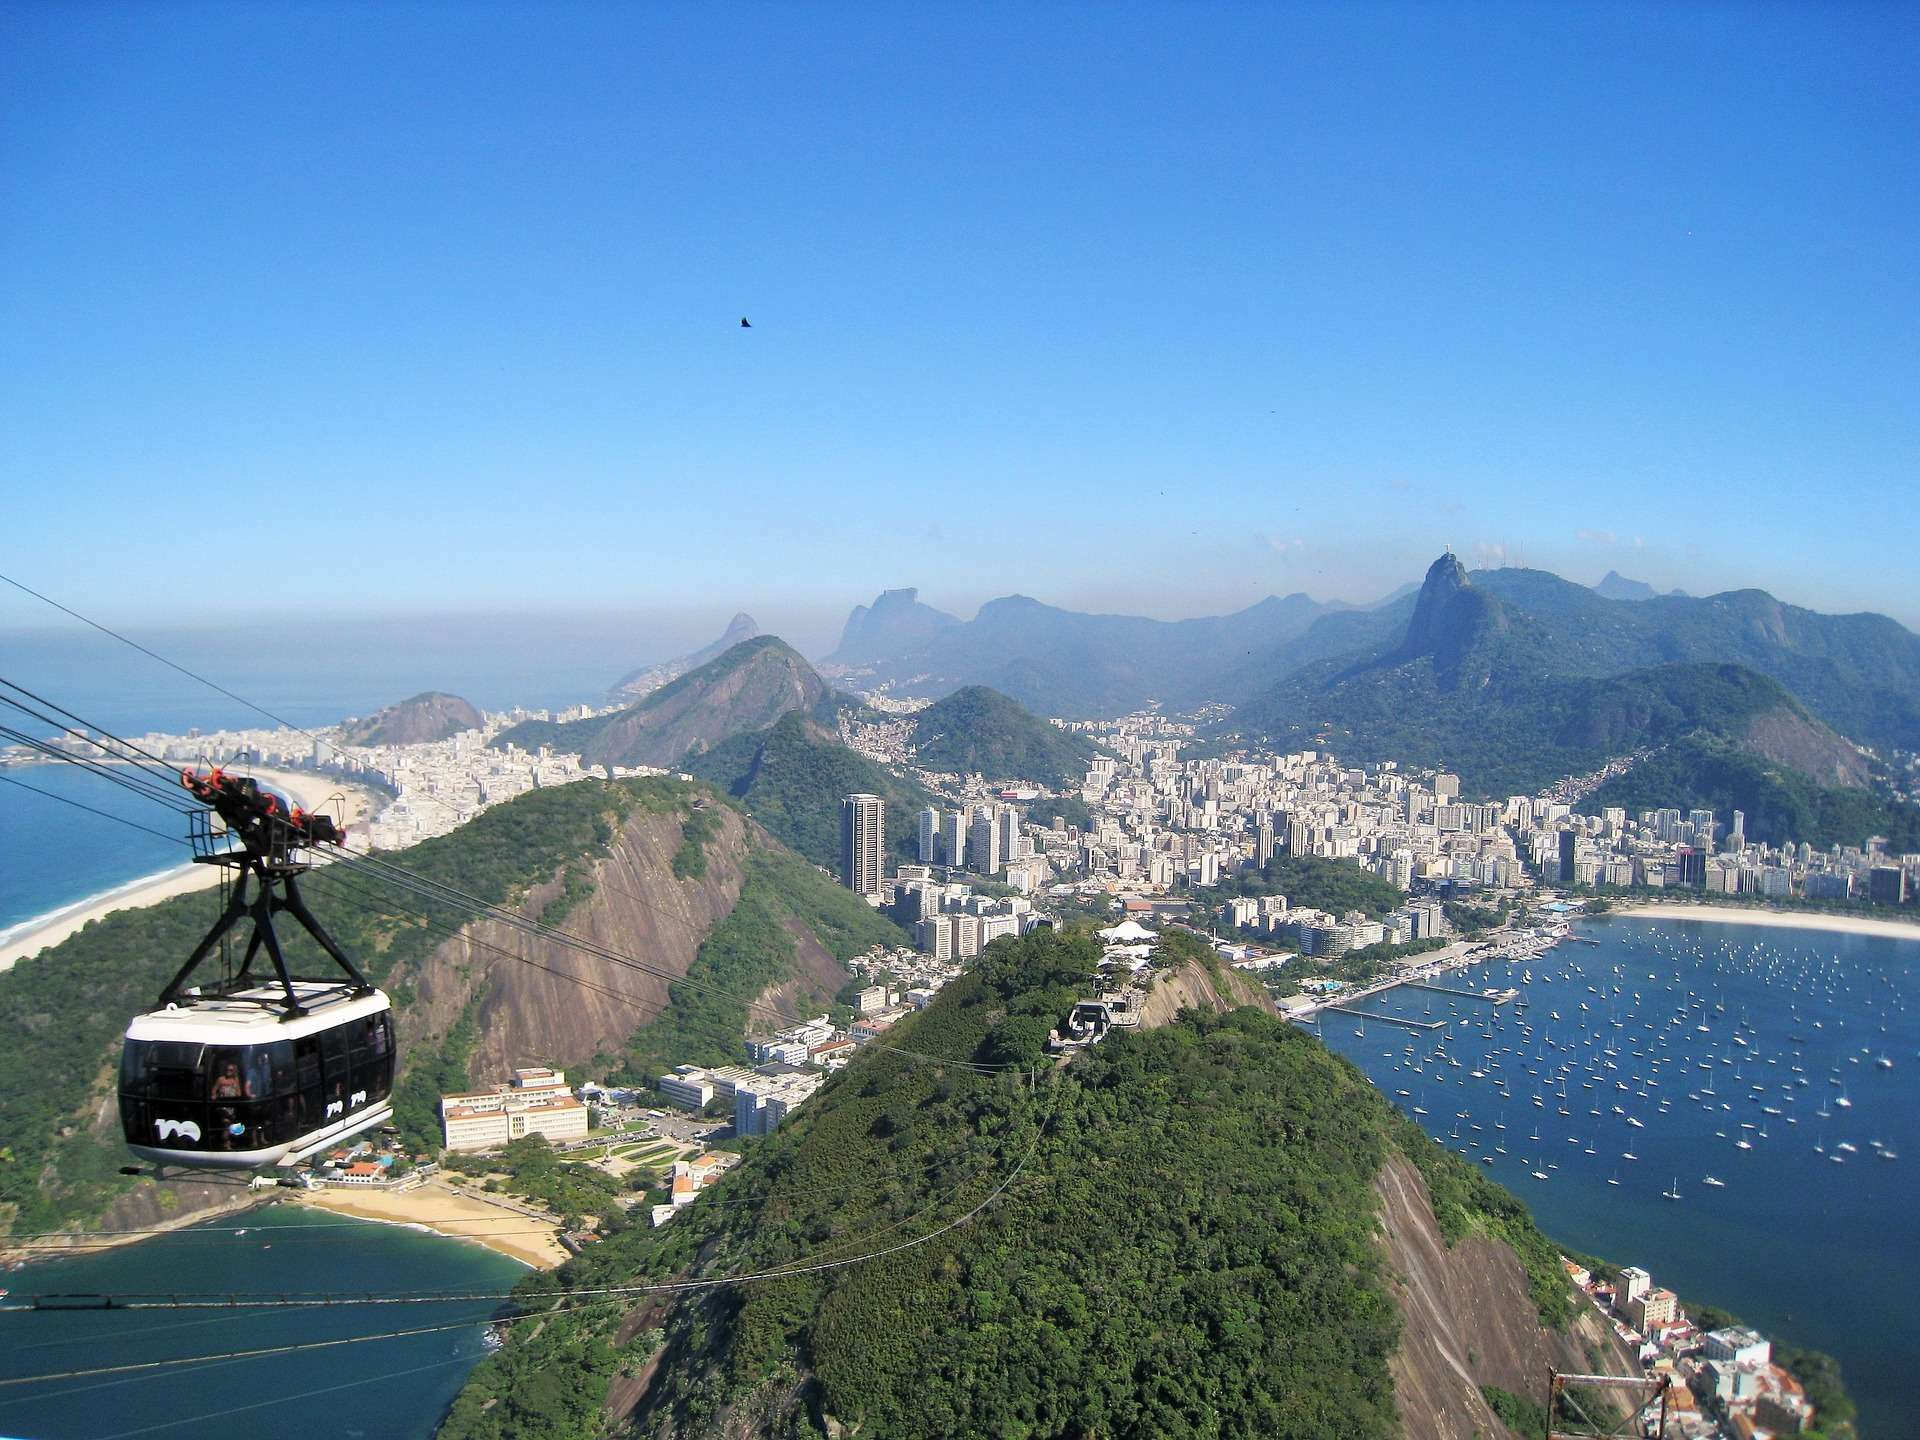 Direktflüge ab Zürich nach Rio de Janeiro